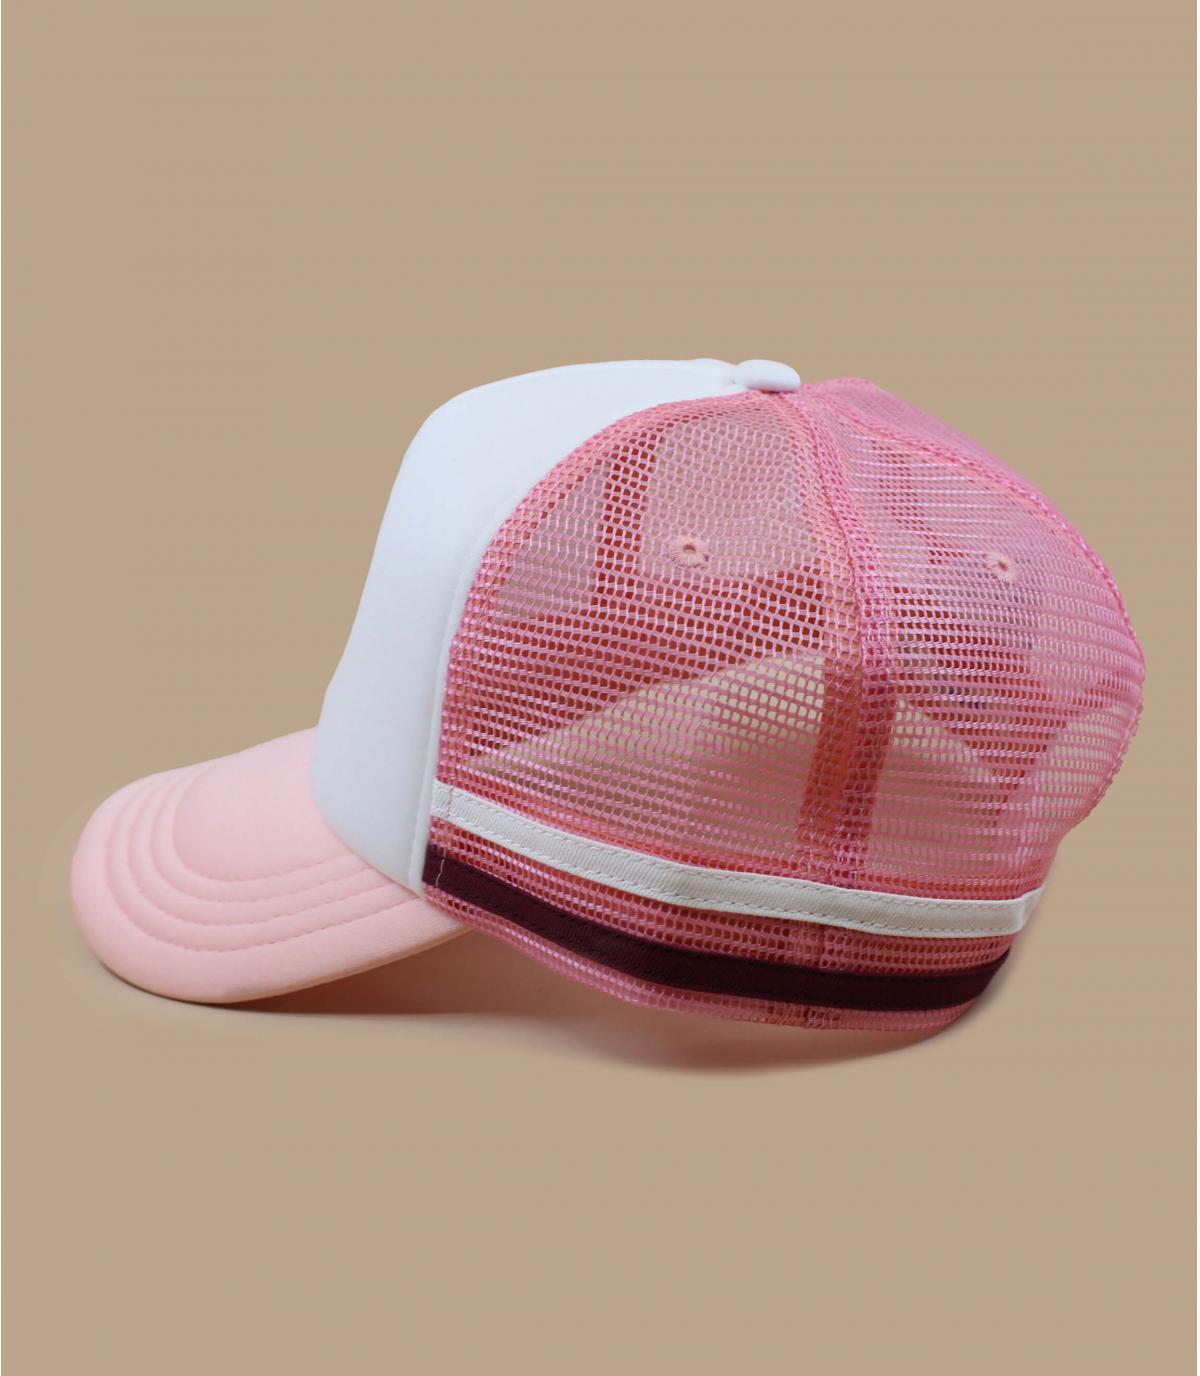 Details Kids Club Trucker pink - Abbildung 4